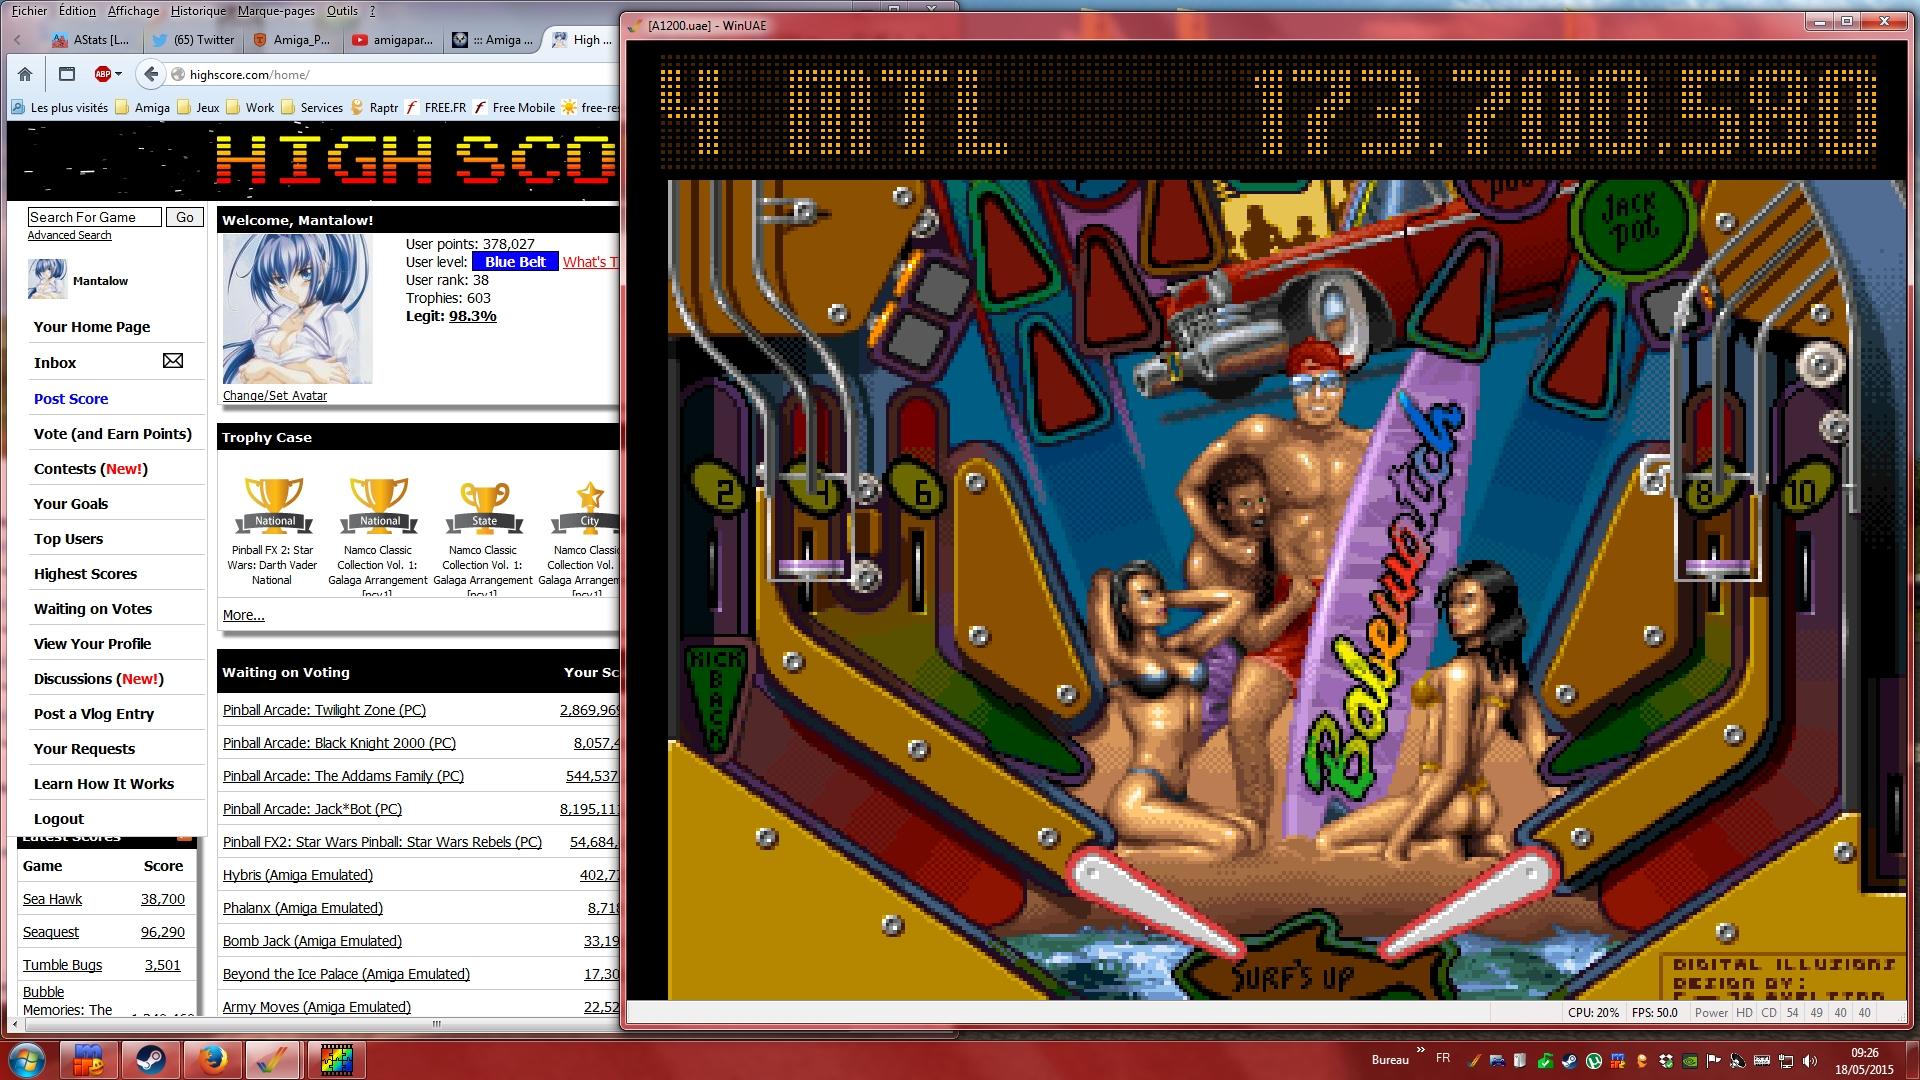 Mantalow: Pinball Illusions: BabeWatch (Amiga Emulated) 173,700,580 points on 2015-05-18 02:37:49